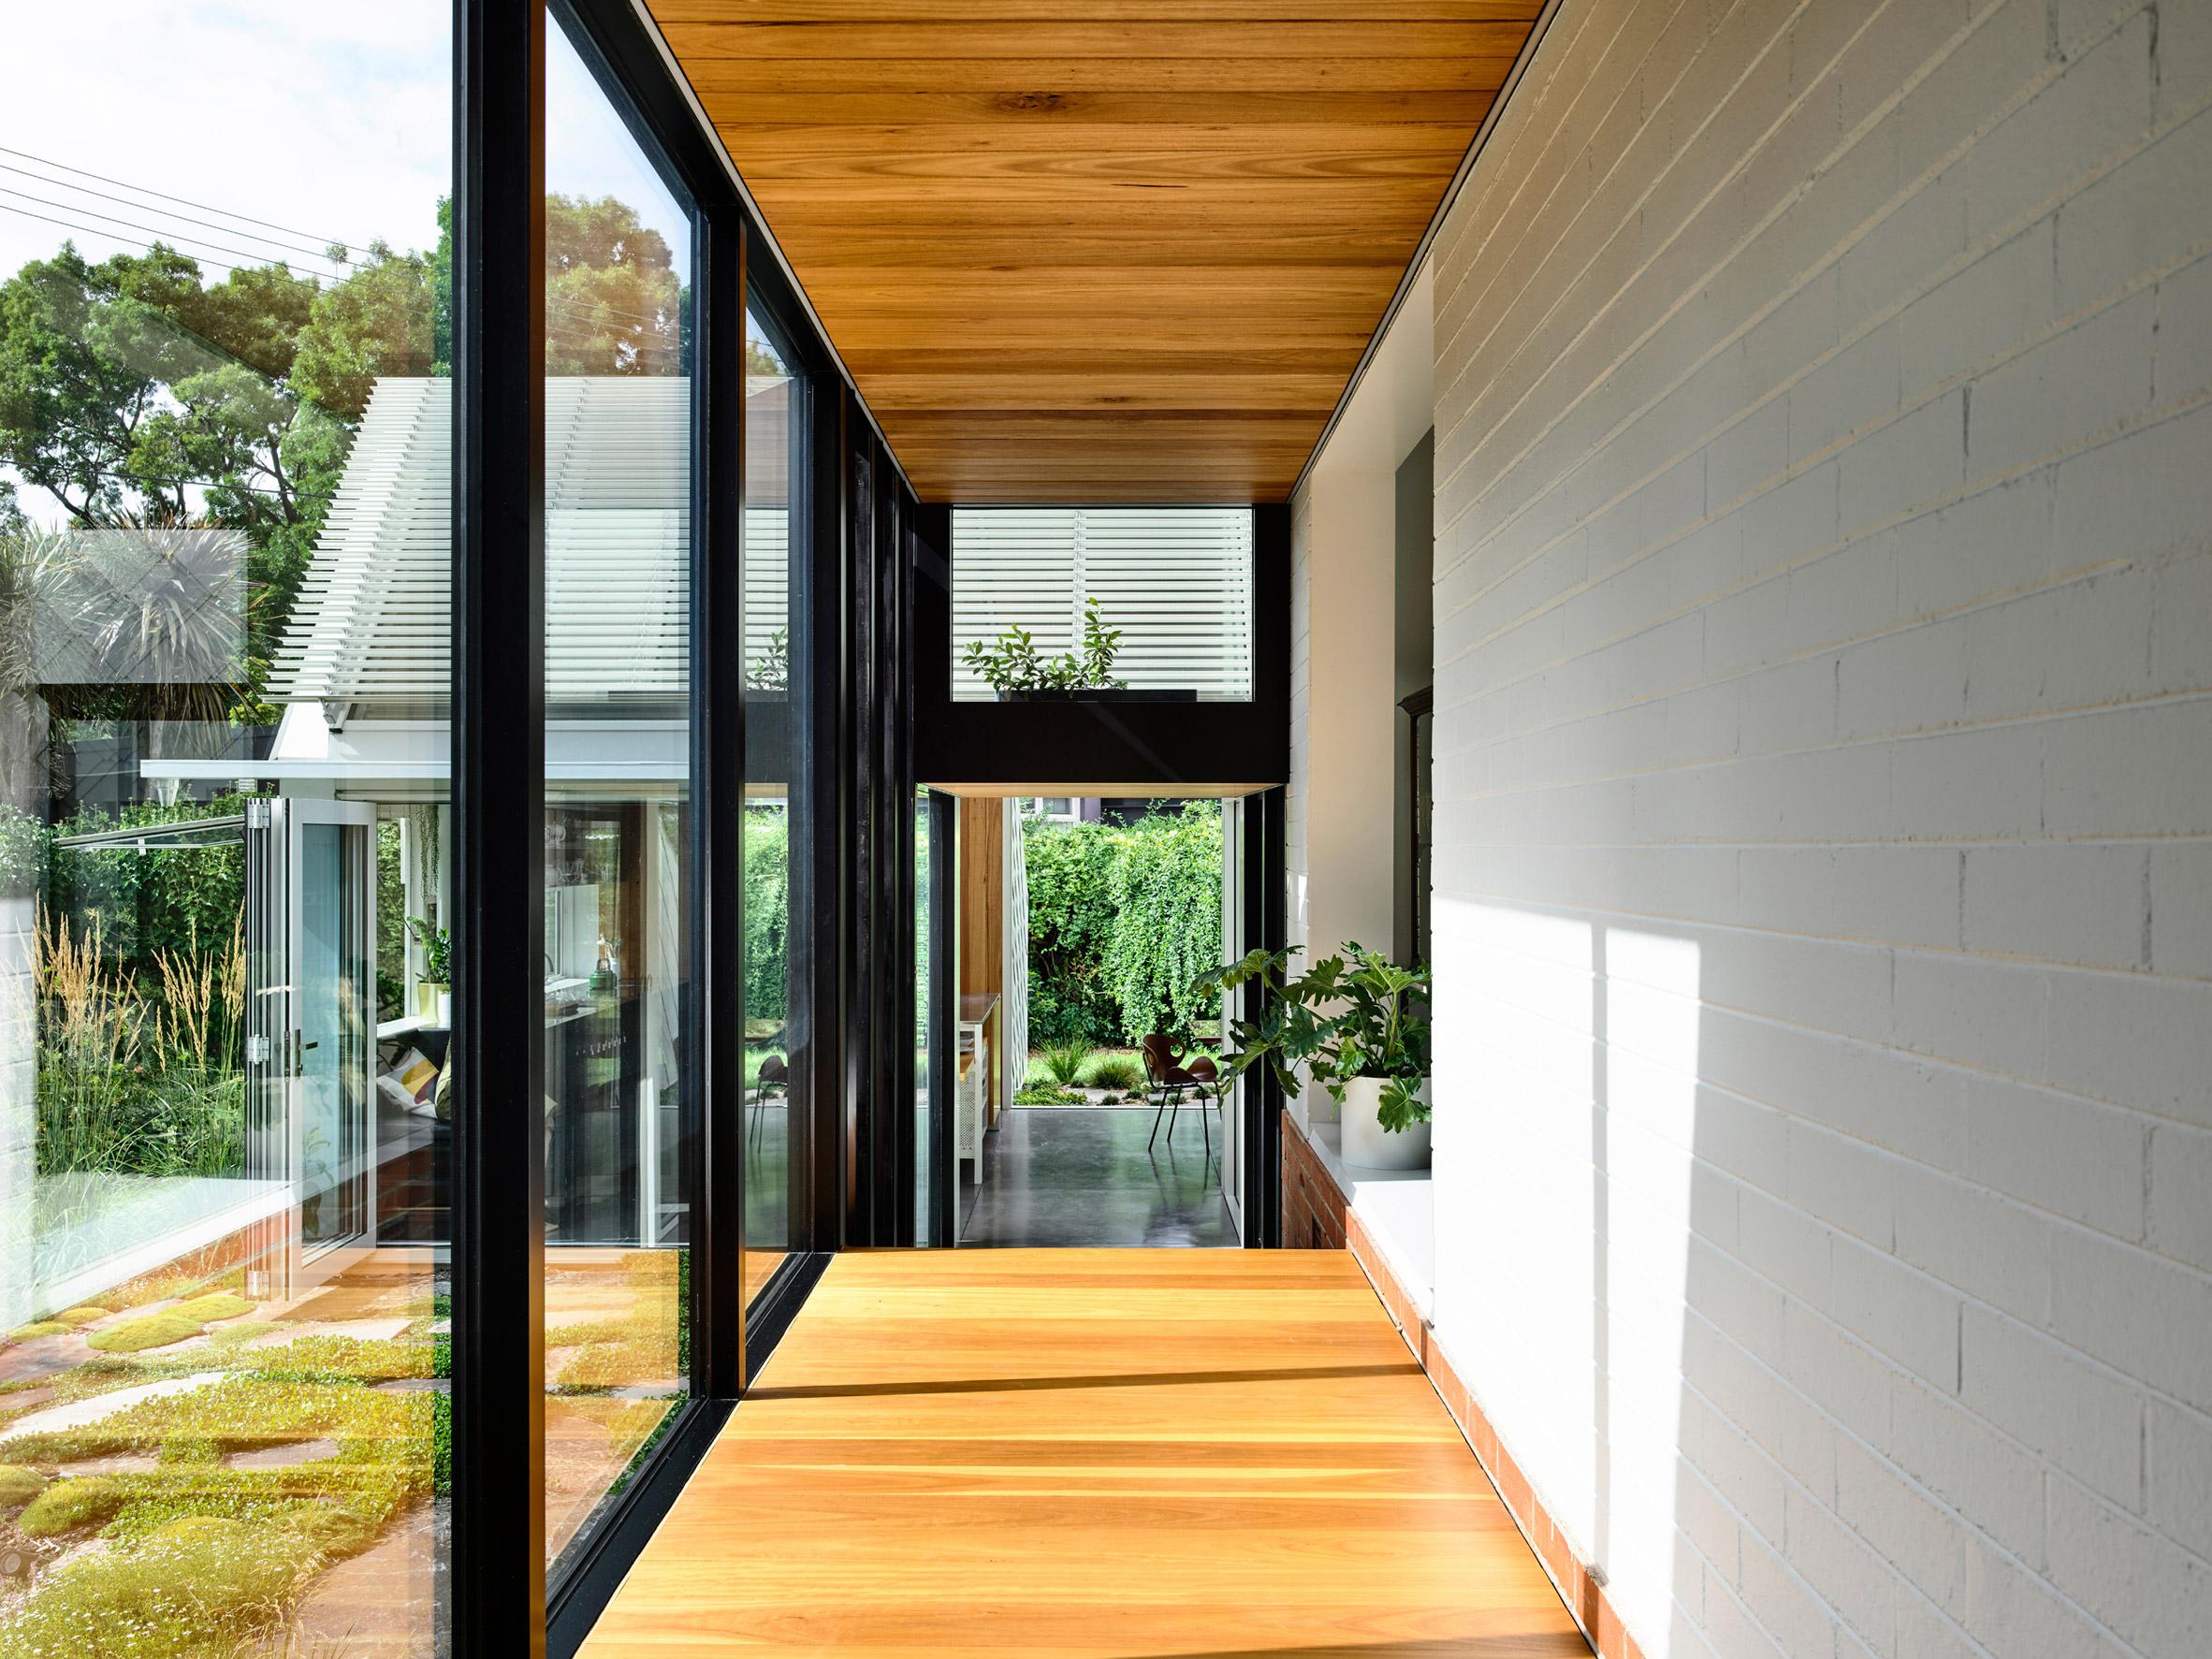 Empire House by Austin Maynard Architects glazed corridor